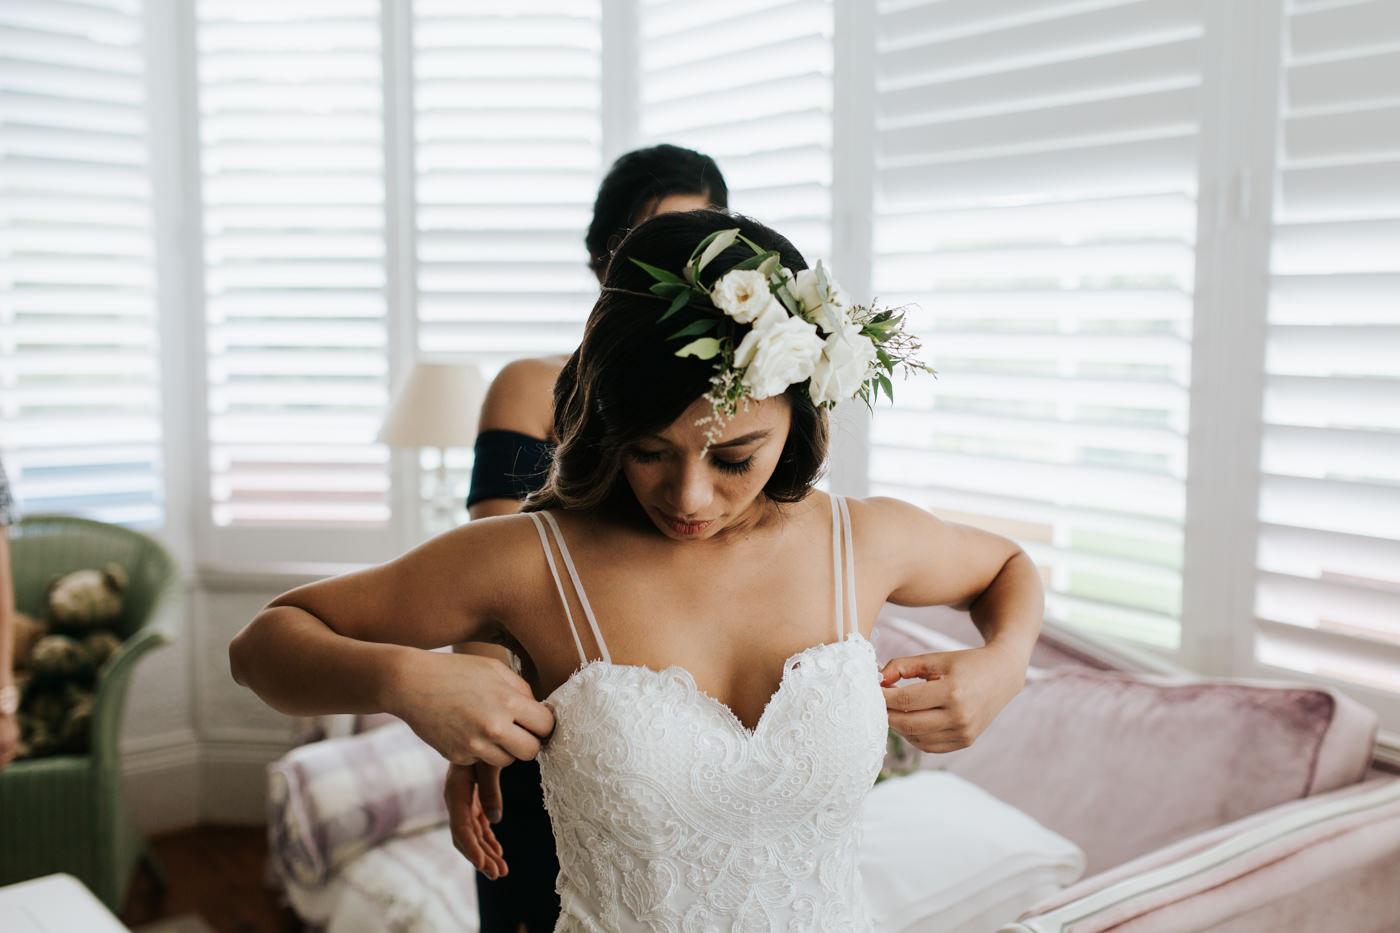 Nick & Vanezza - Fernbank Farm Wedding - Samantha Heather Photography-30.jpg